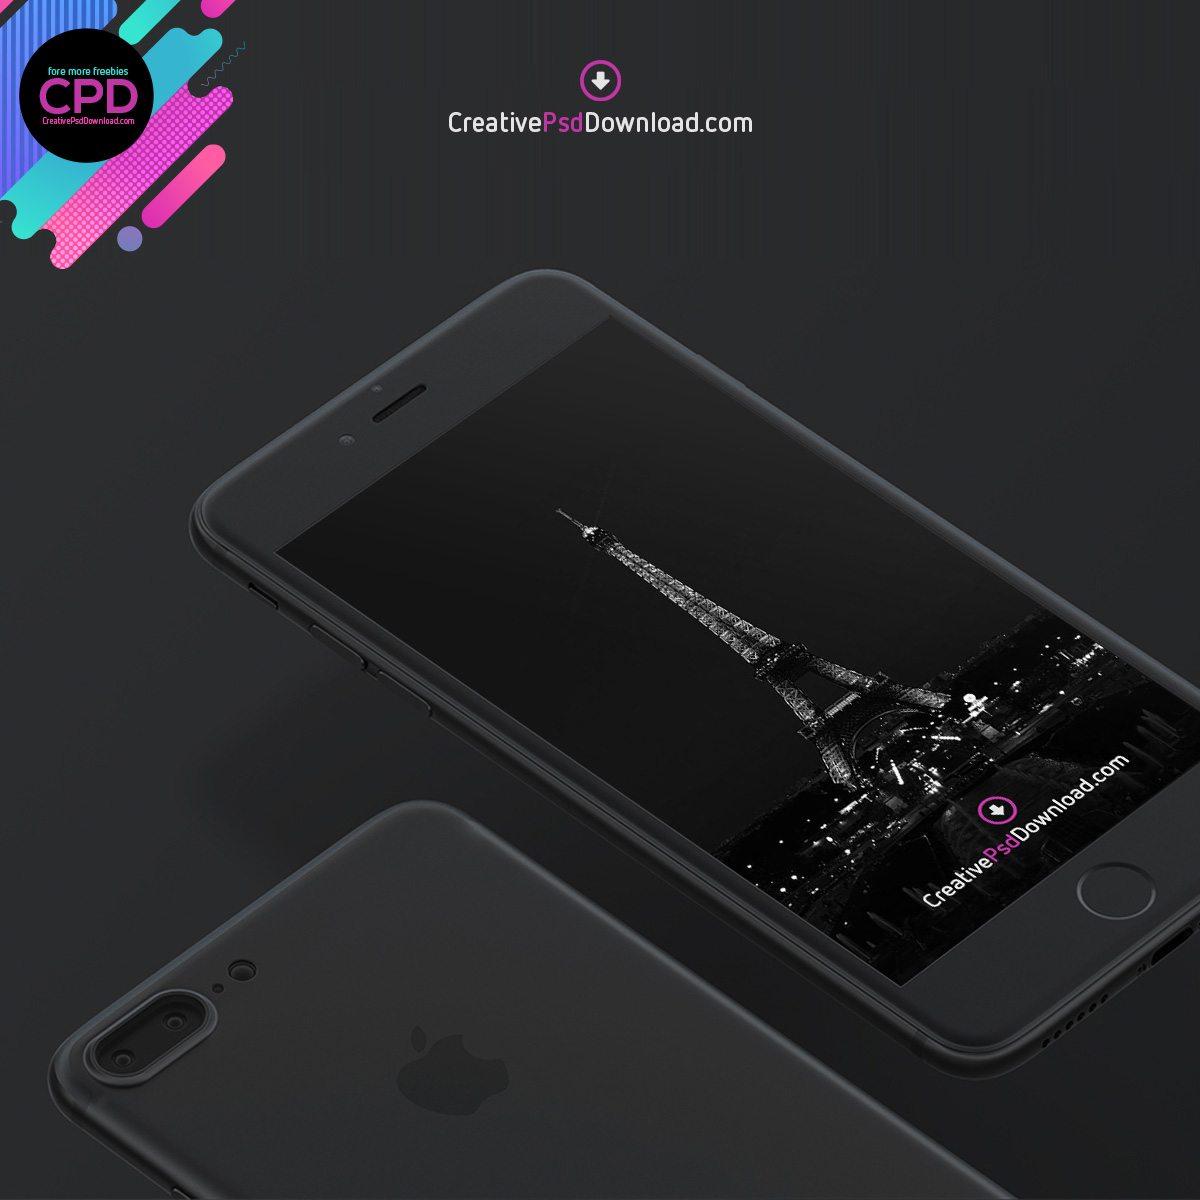 Premium iPhone 7 Psd Mockup Thumbnail